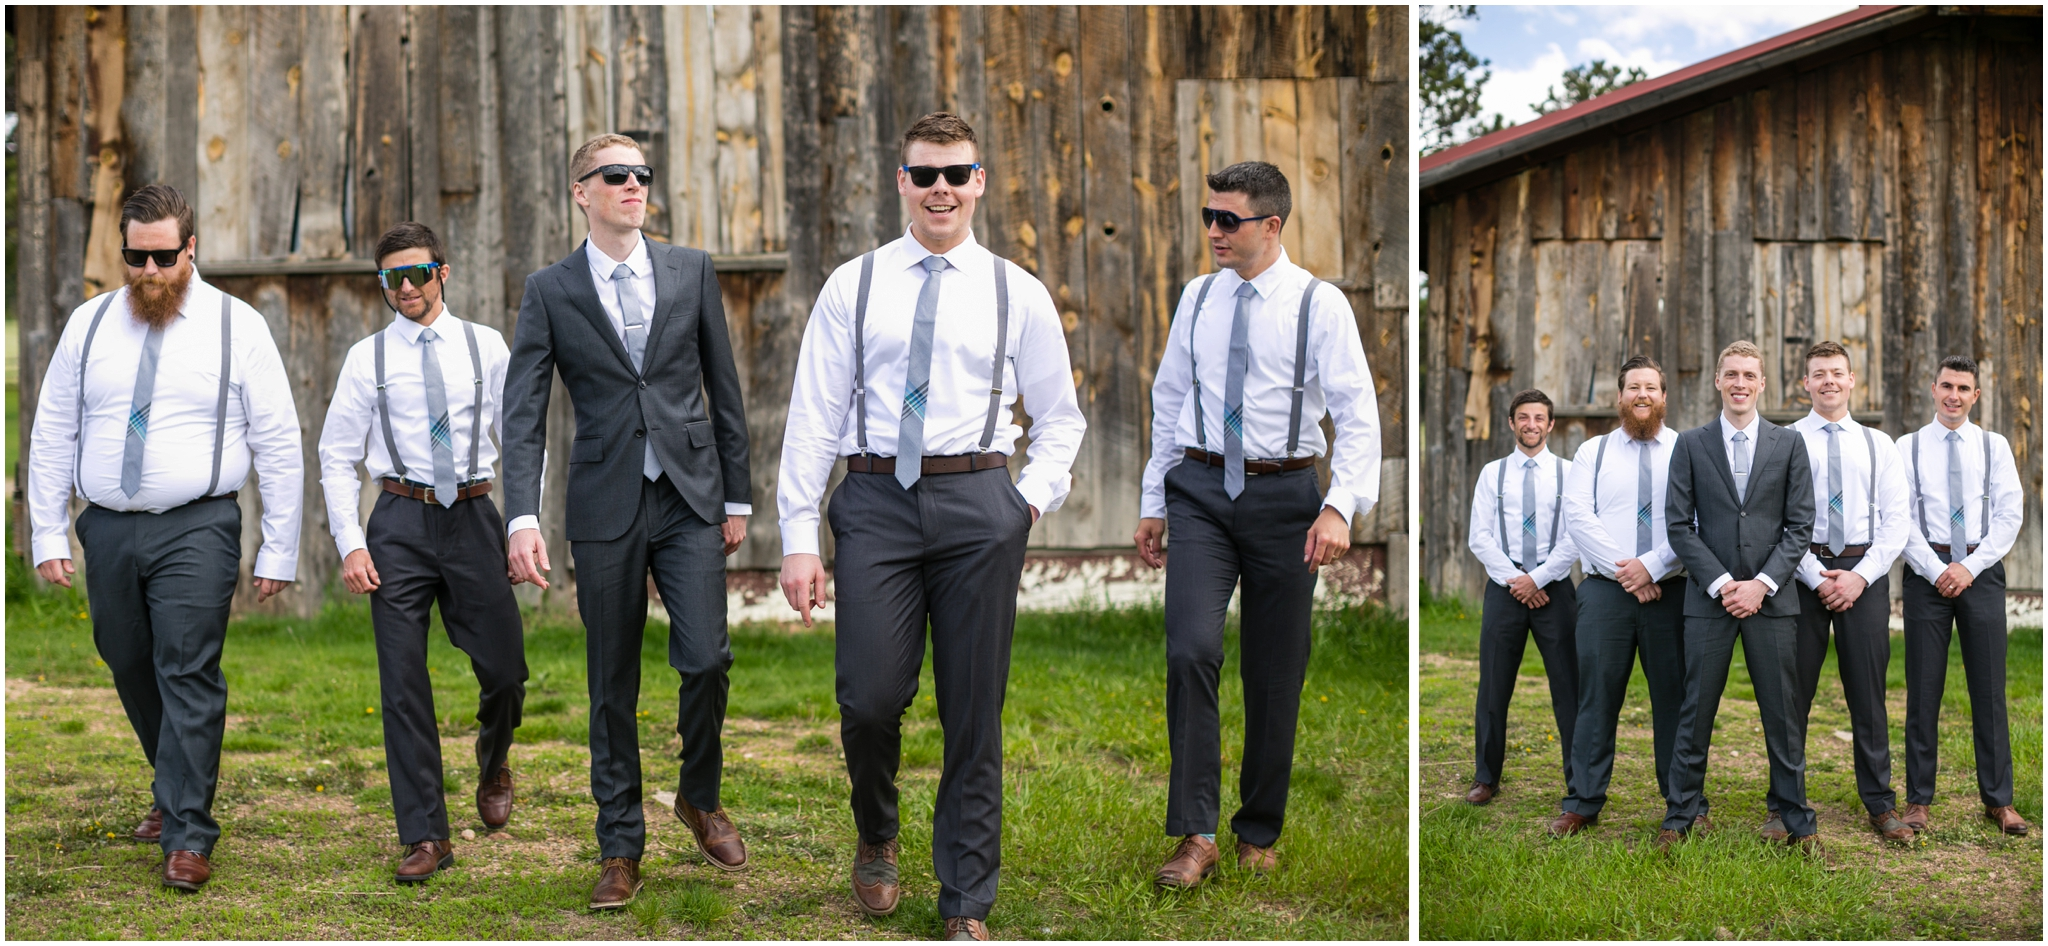 Evergreen_Barn_Wedding_Photographers_Groomsmen.JPG